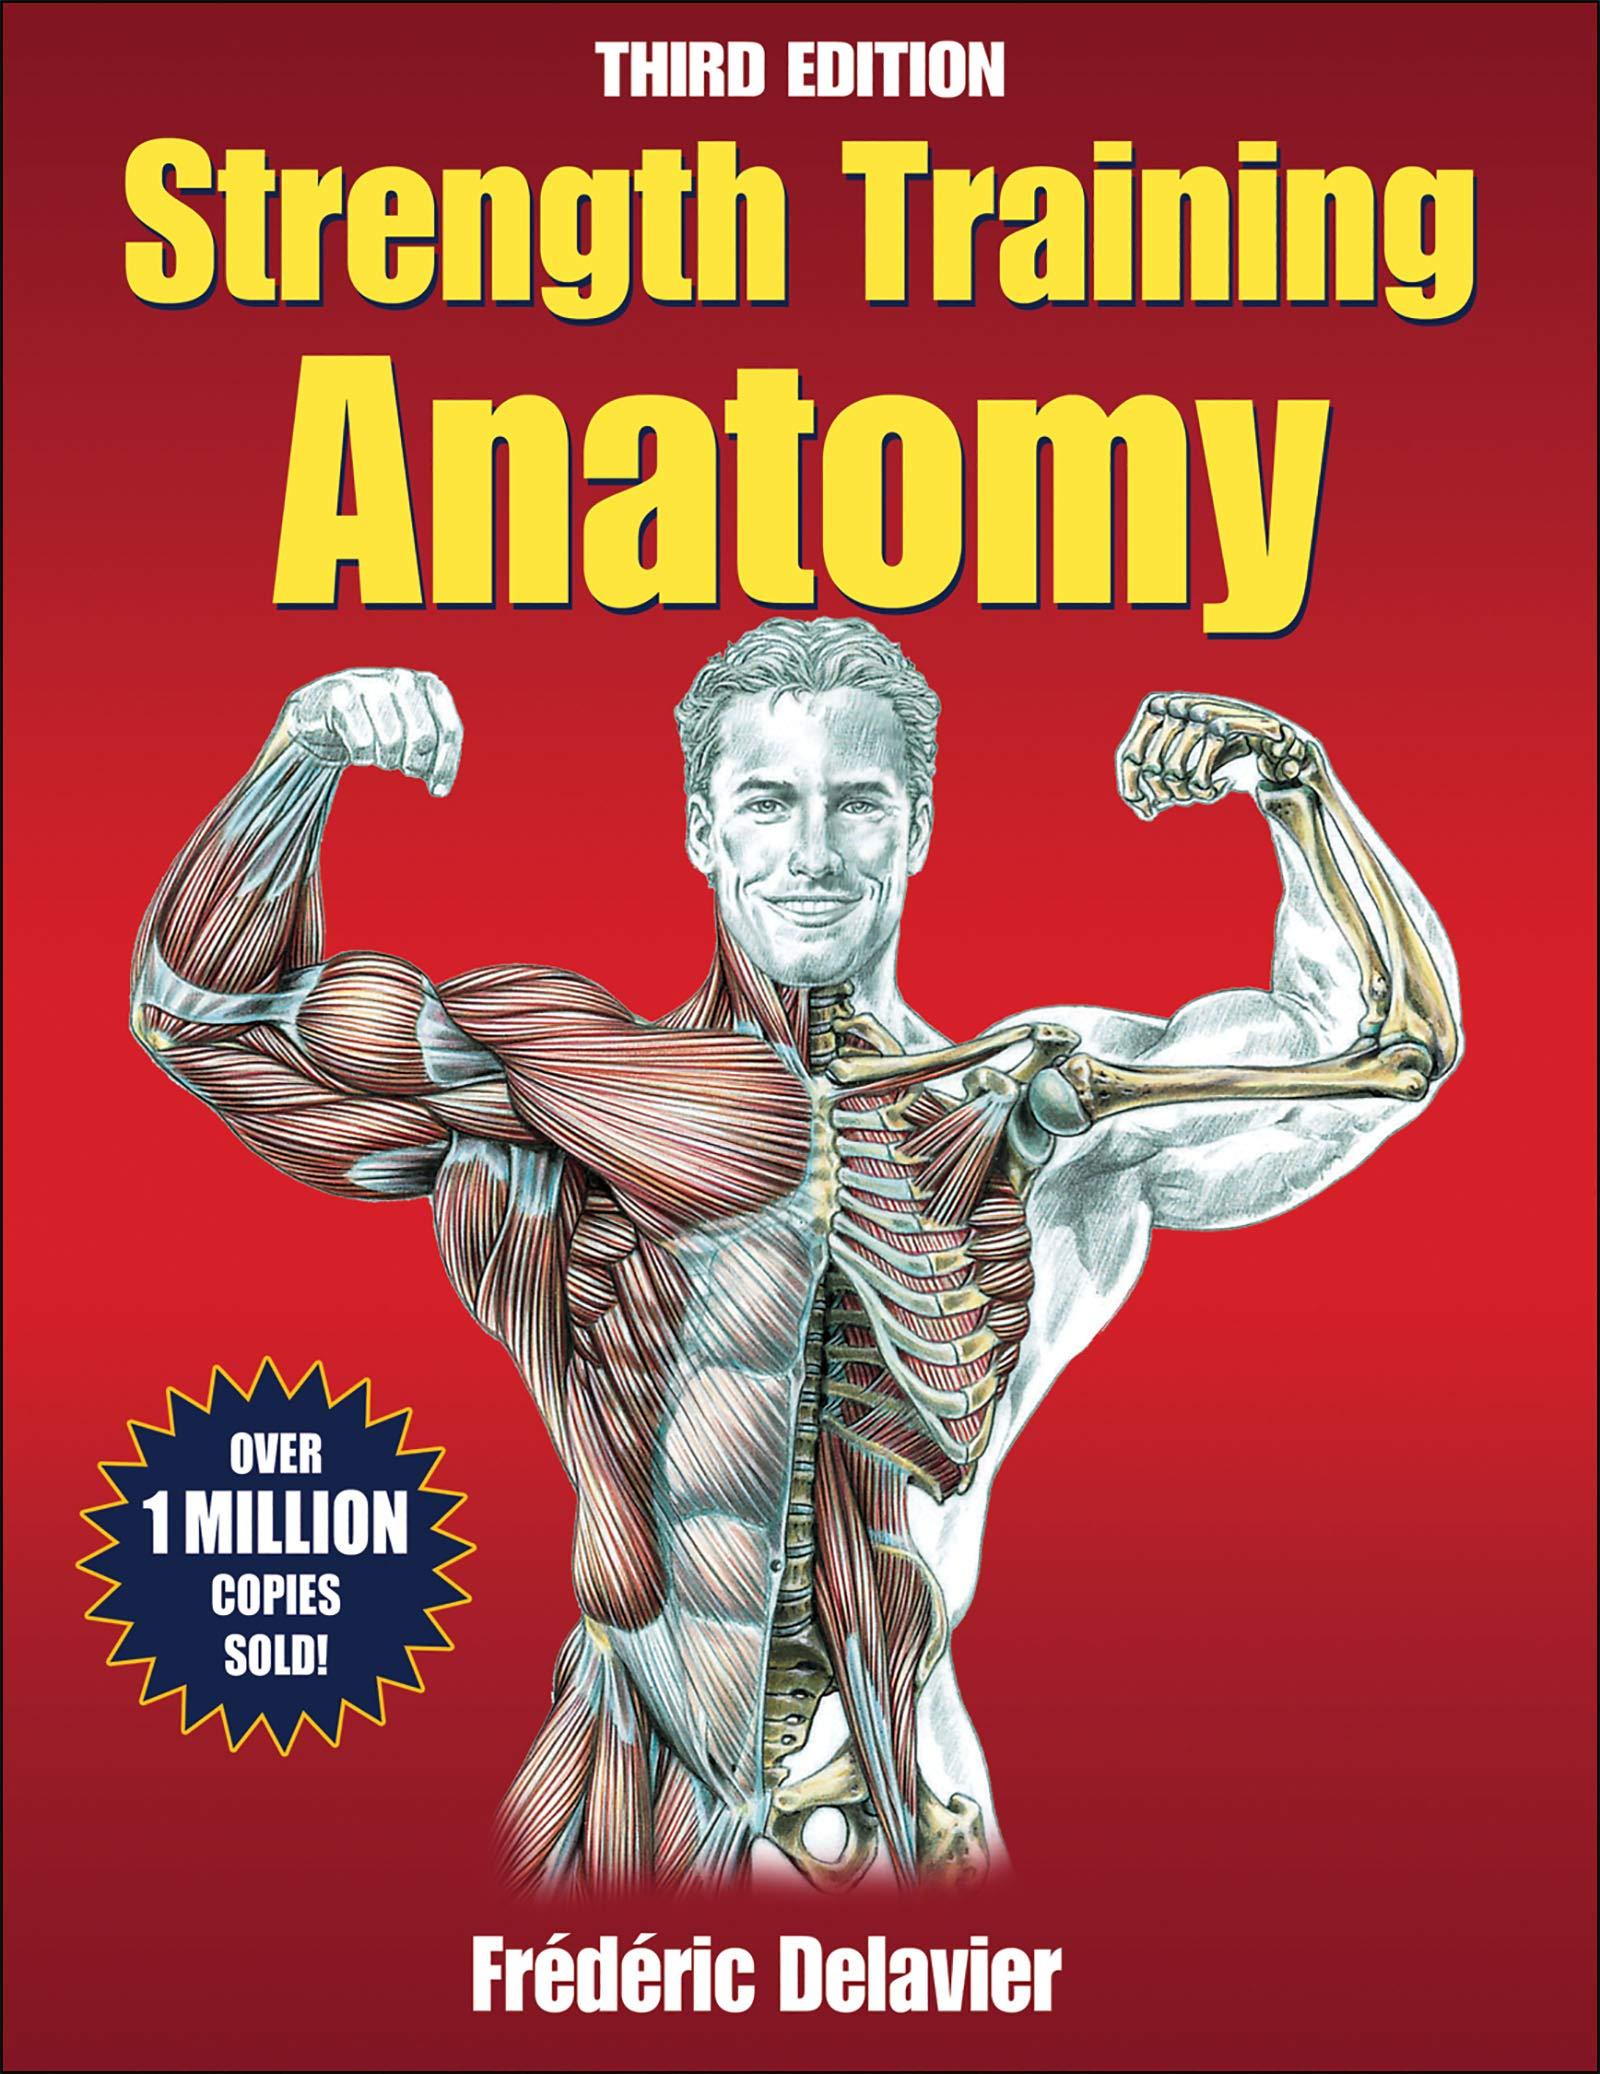 Strength Training Anatomy, 3rd Edition by imusti